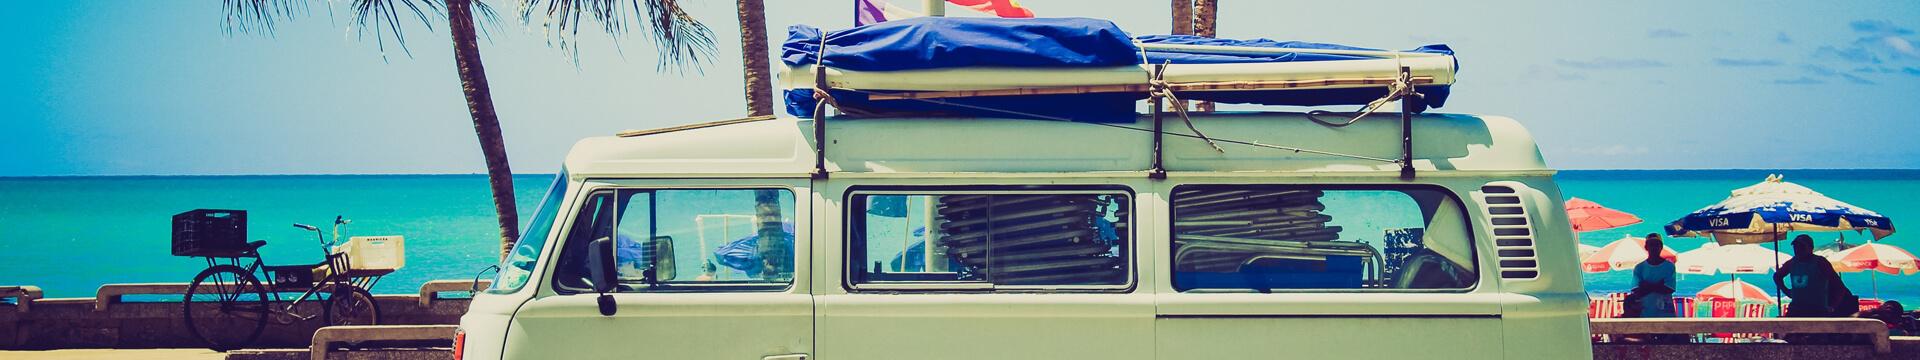 Campingplatz Service | Adria Camps